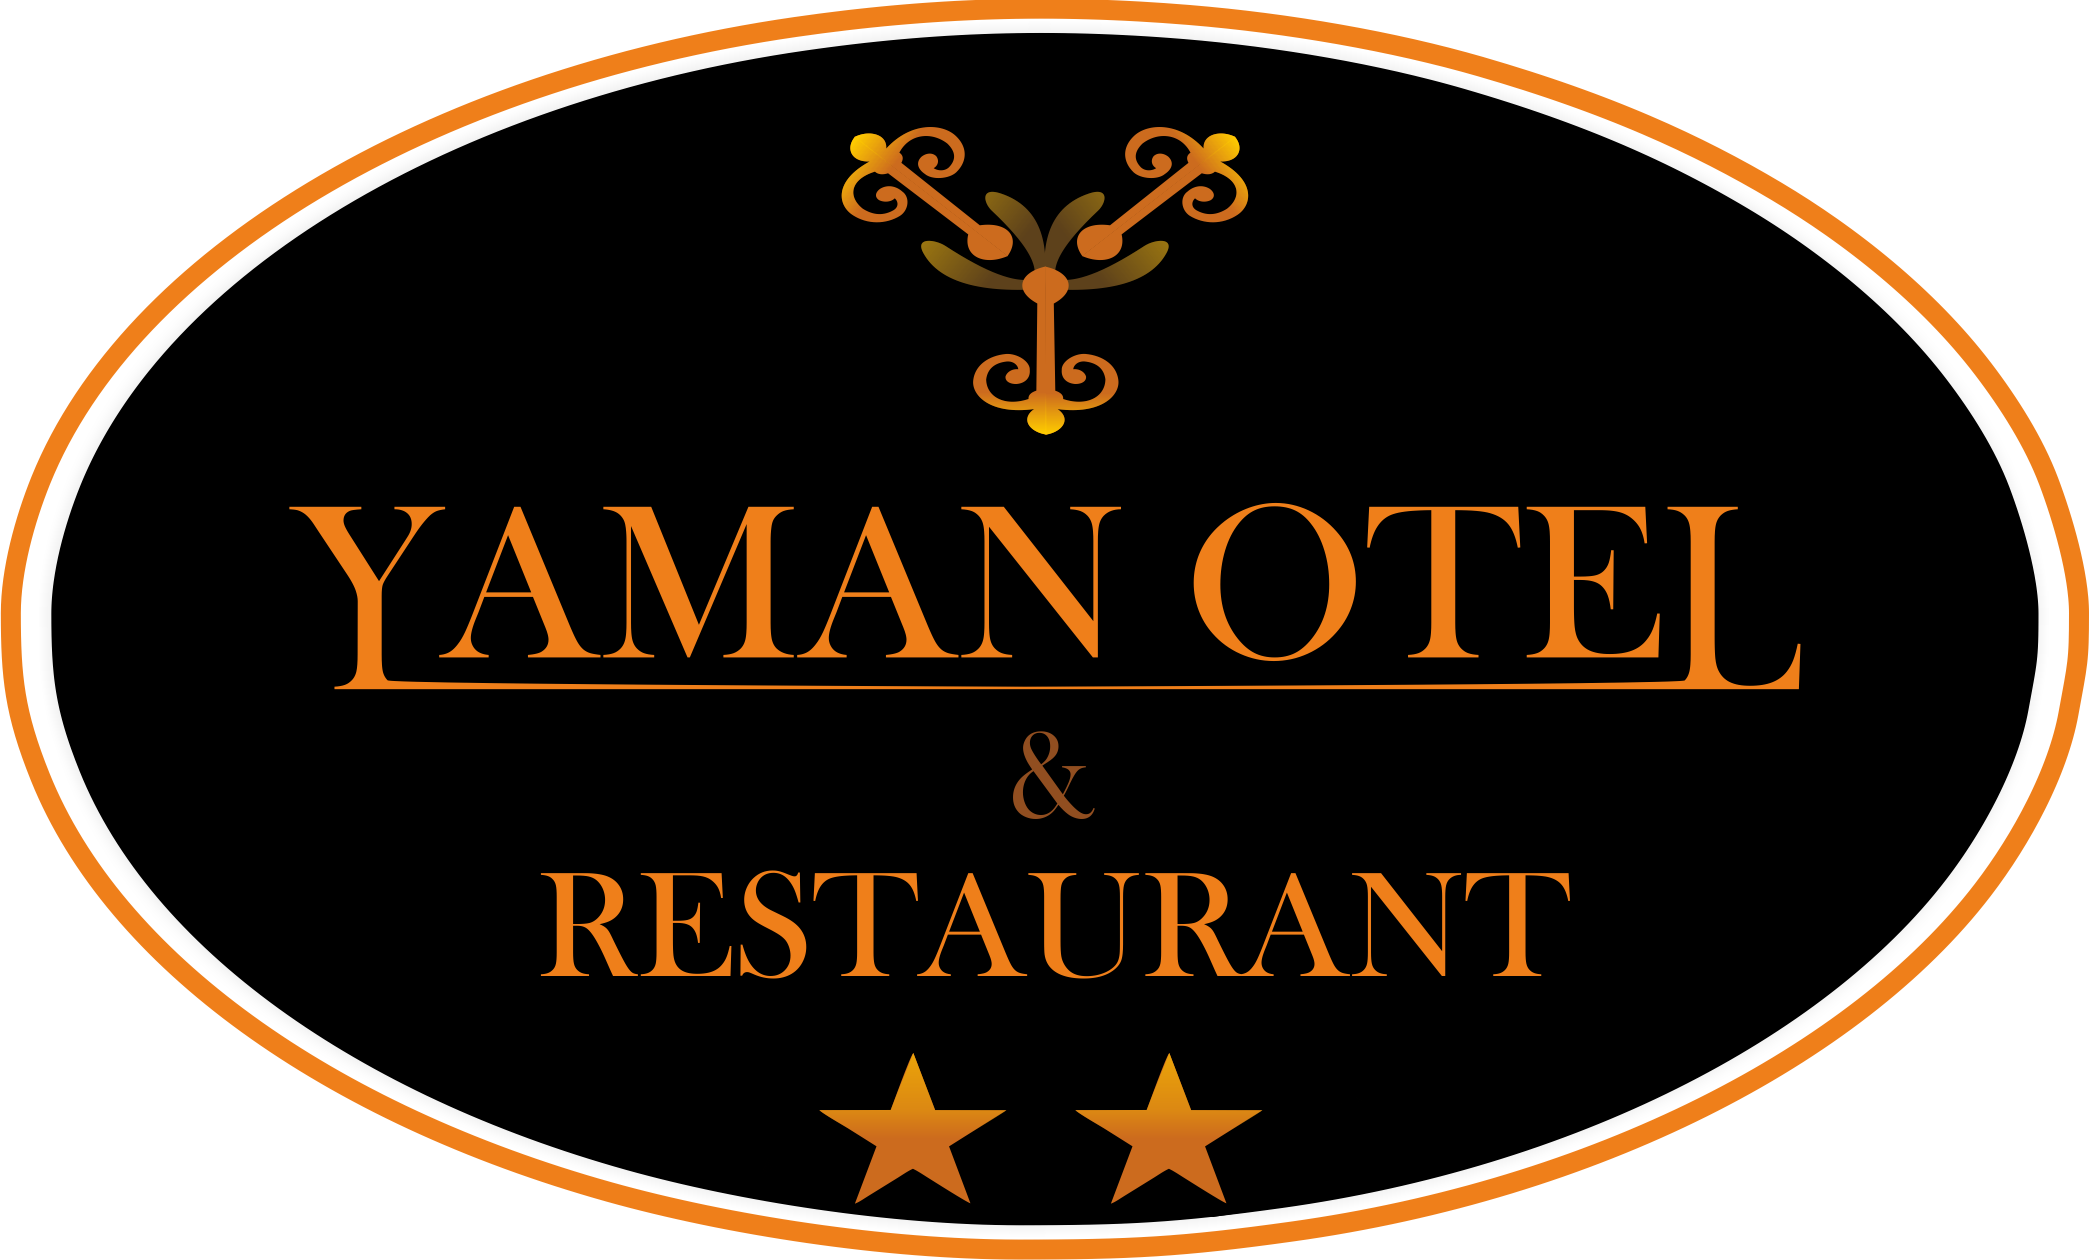 Yaman Otel Restaurant